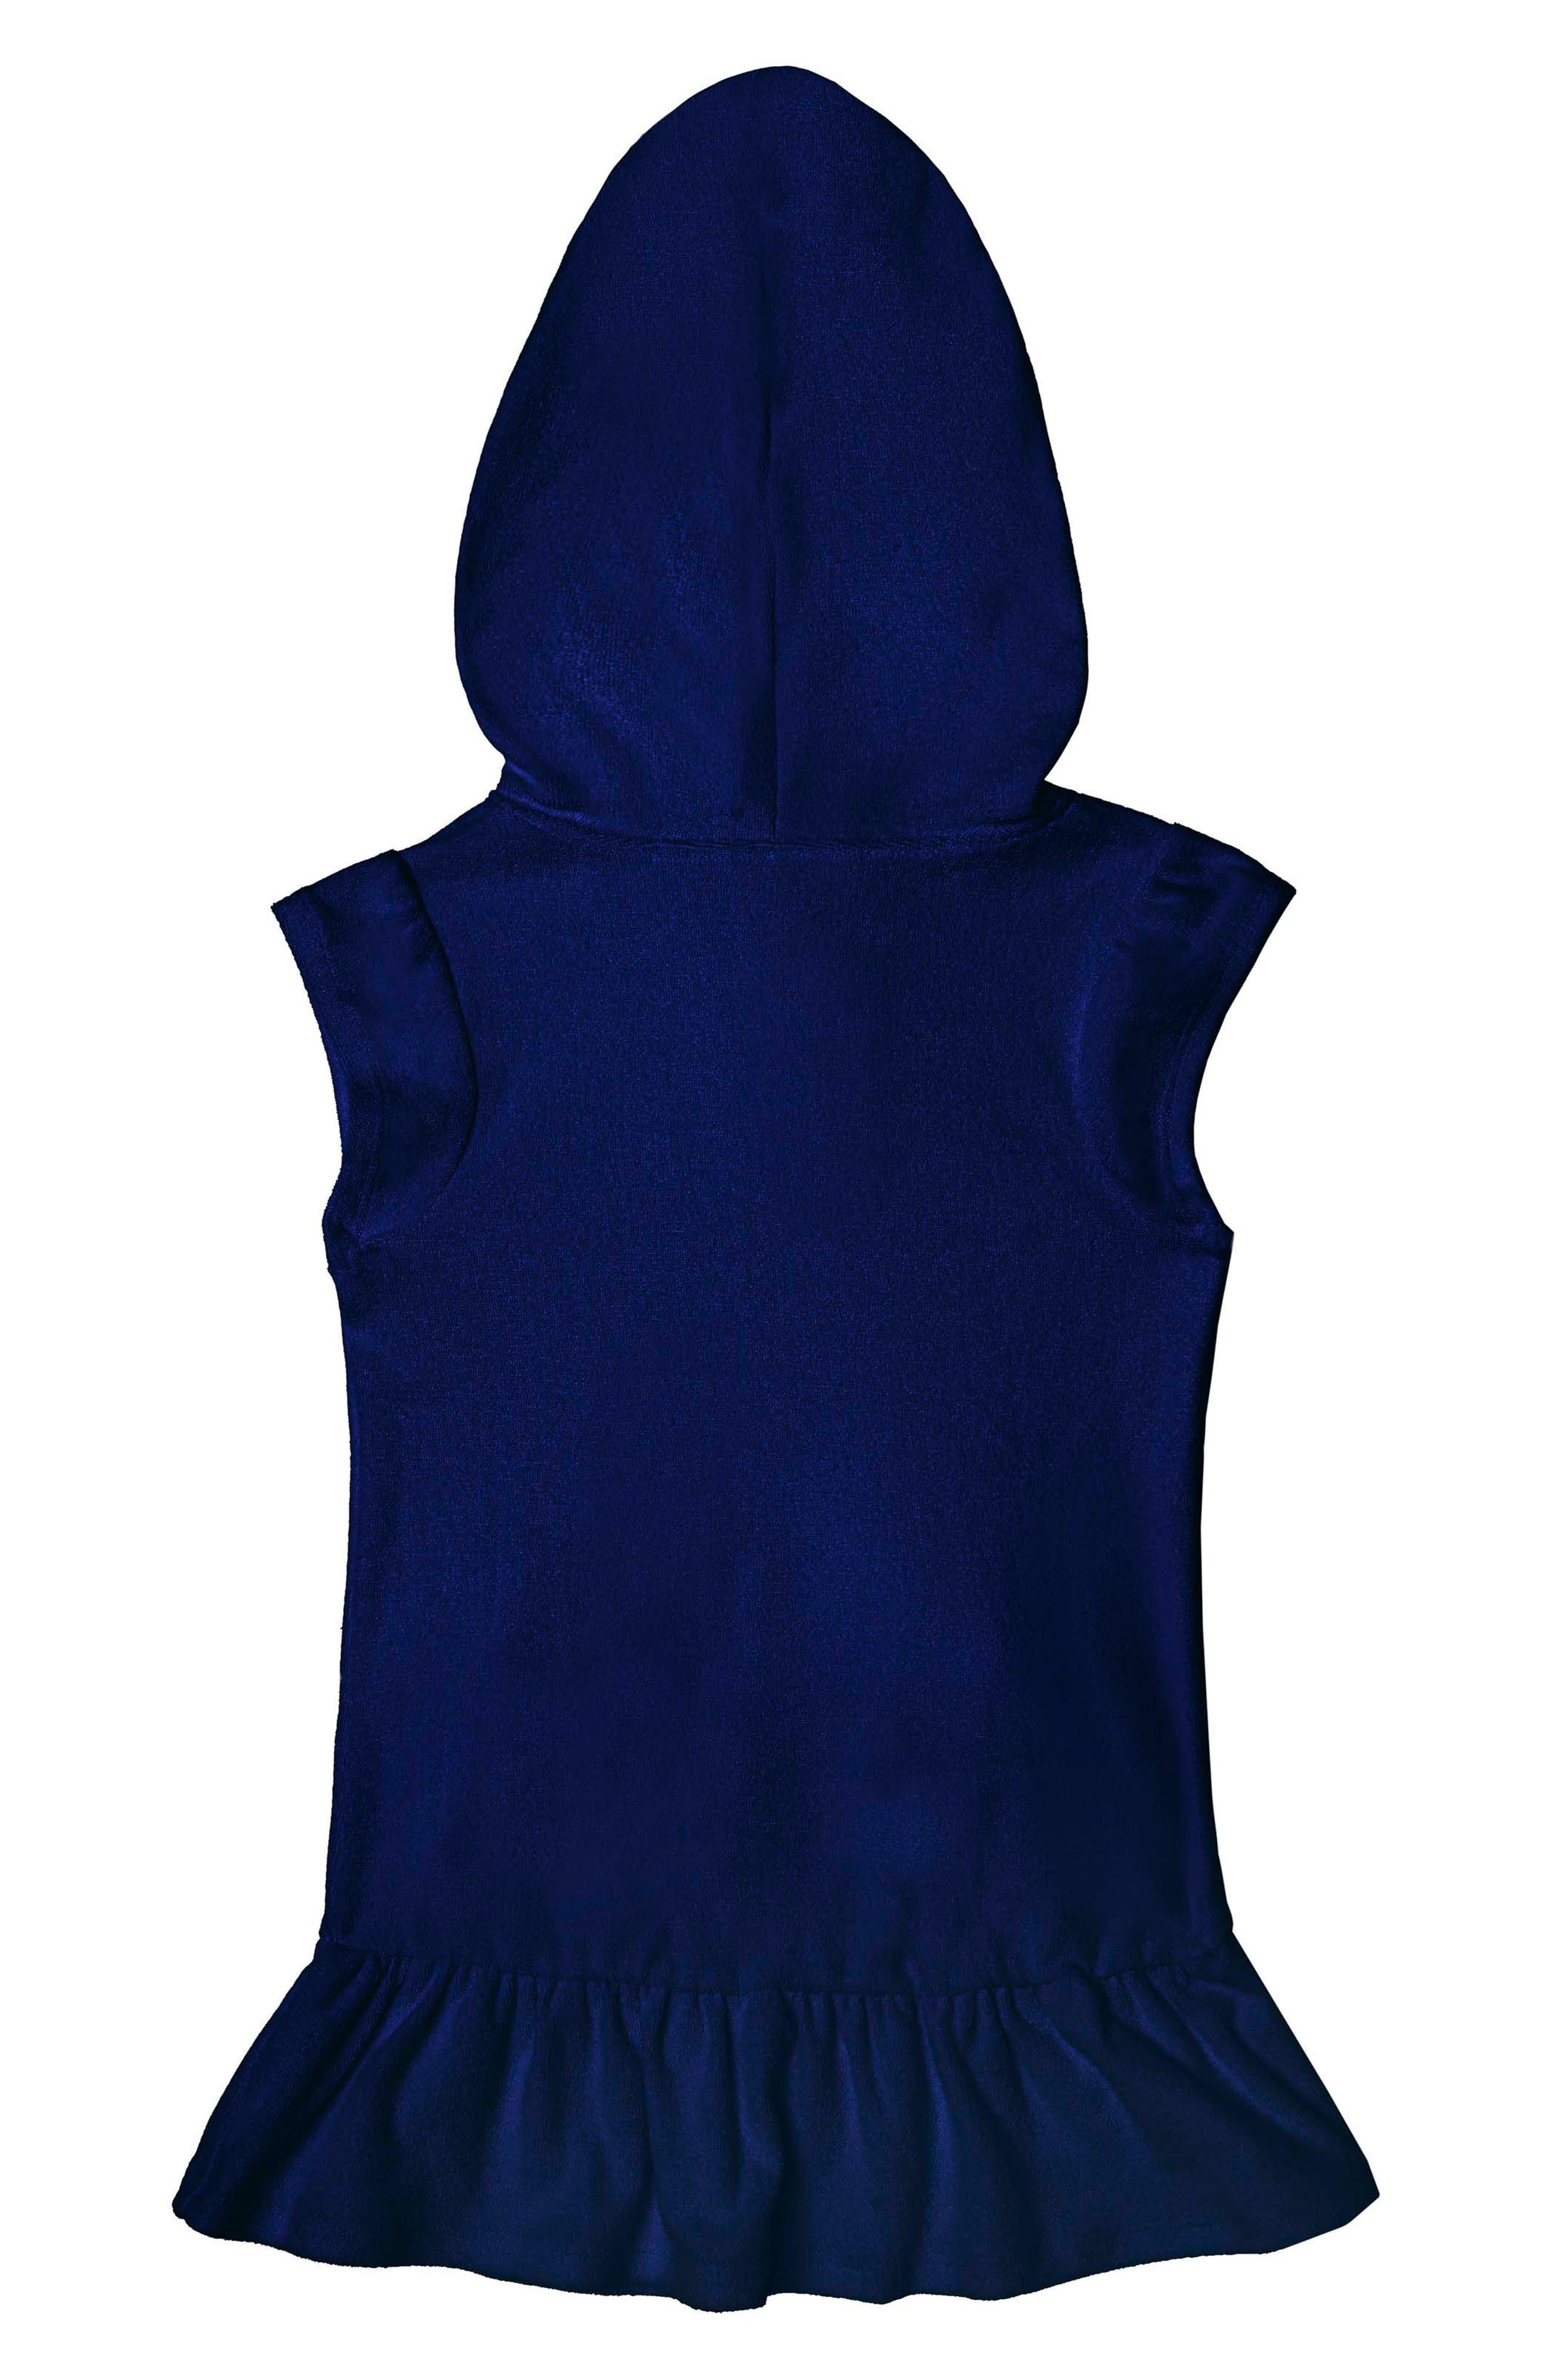 Alternate Image 2  - Hula Star Cotton Cloud Hooded Cover-Up Dress (Toddler Girls & Little Girls)